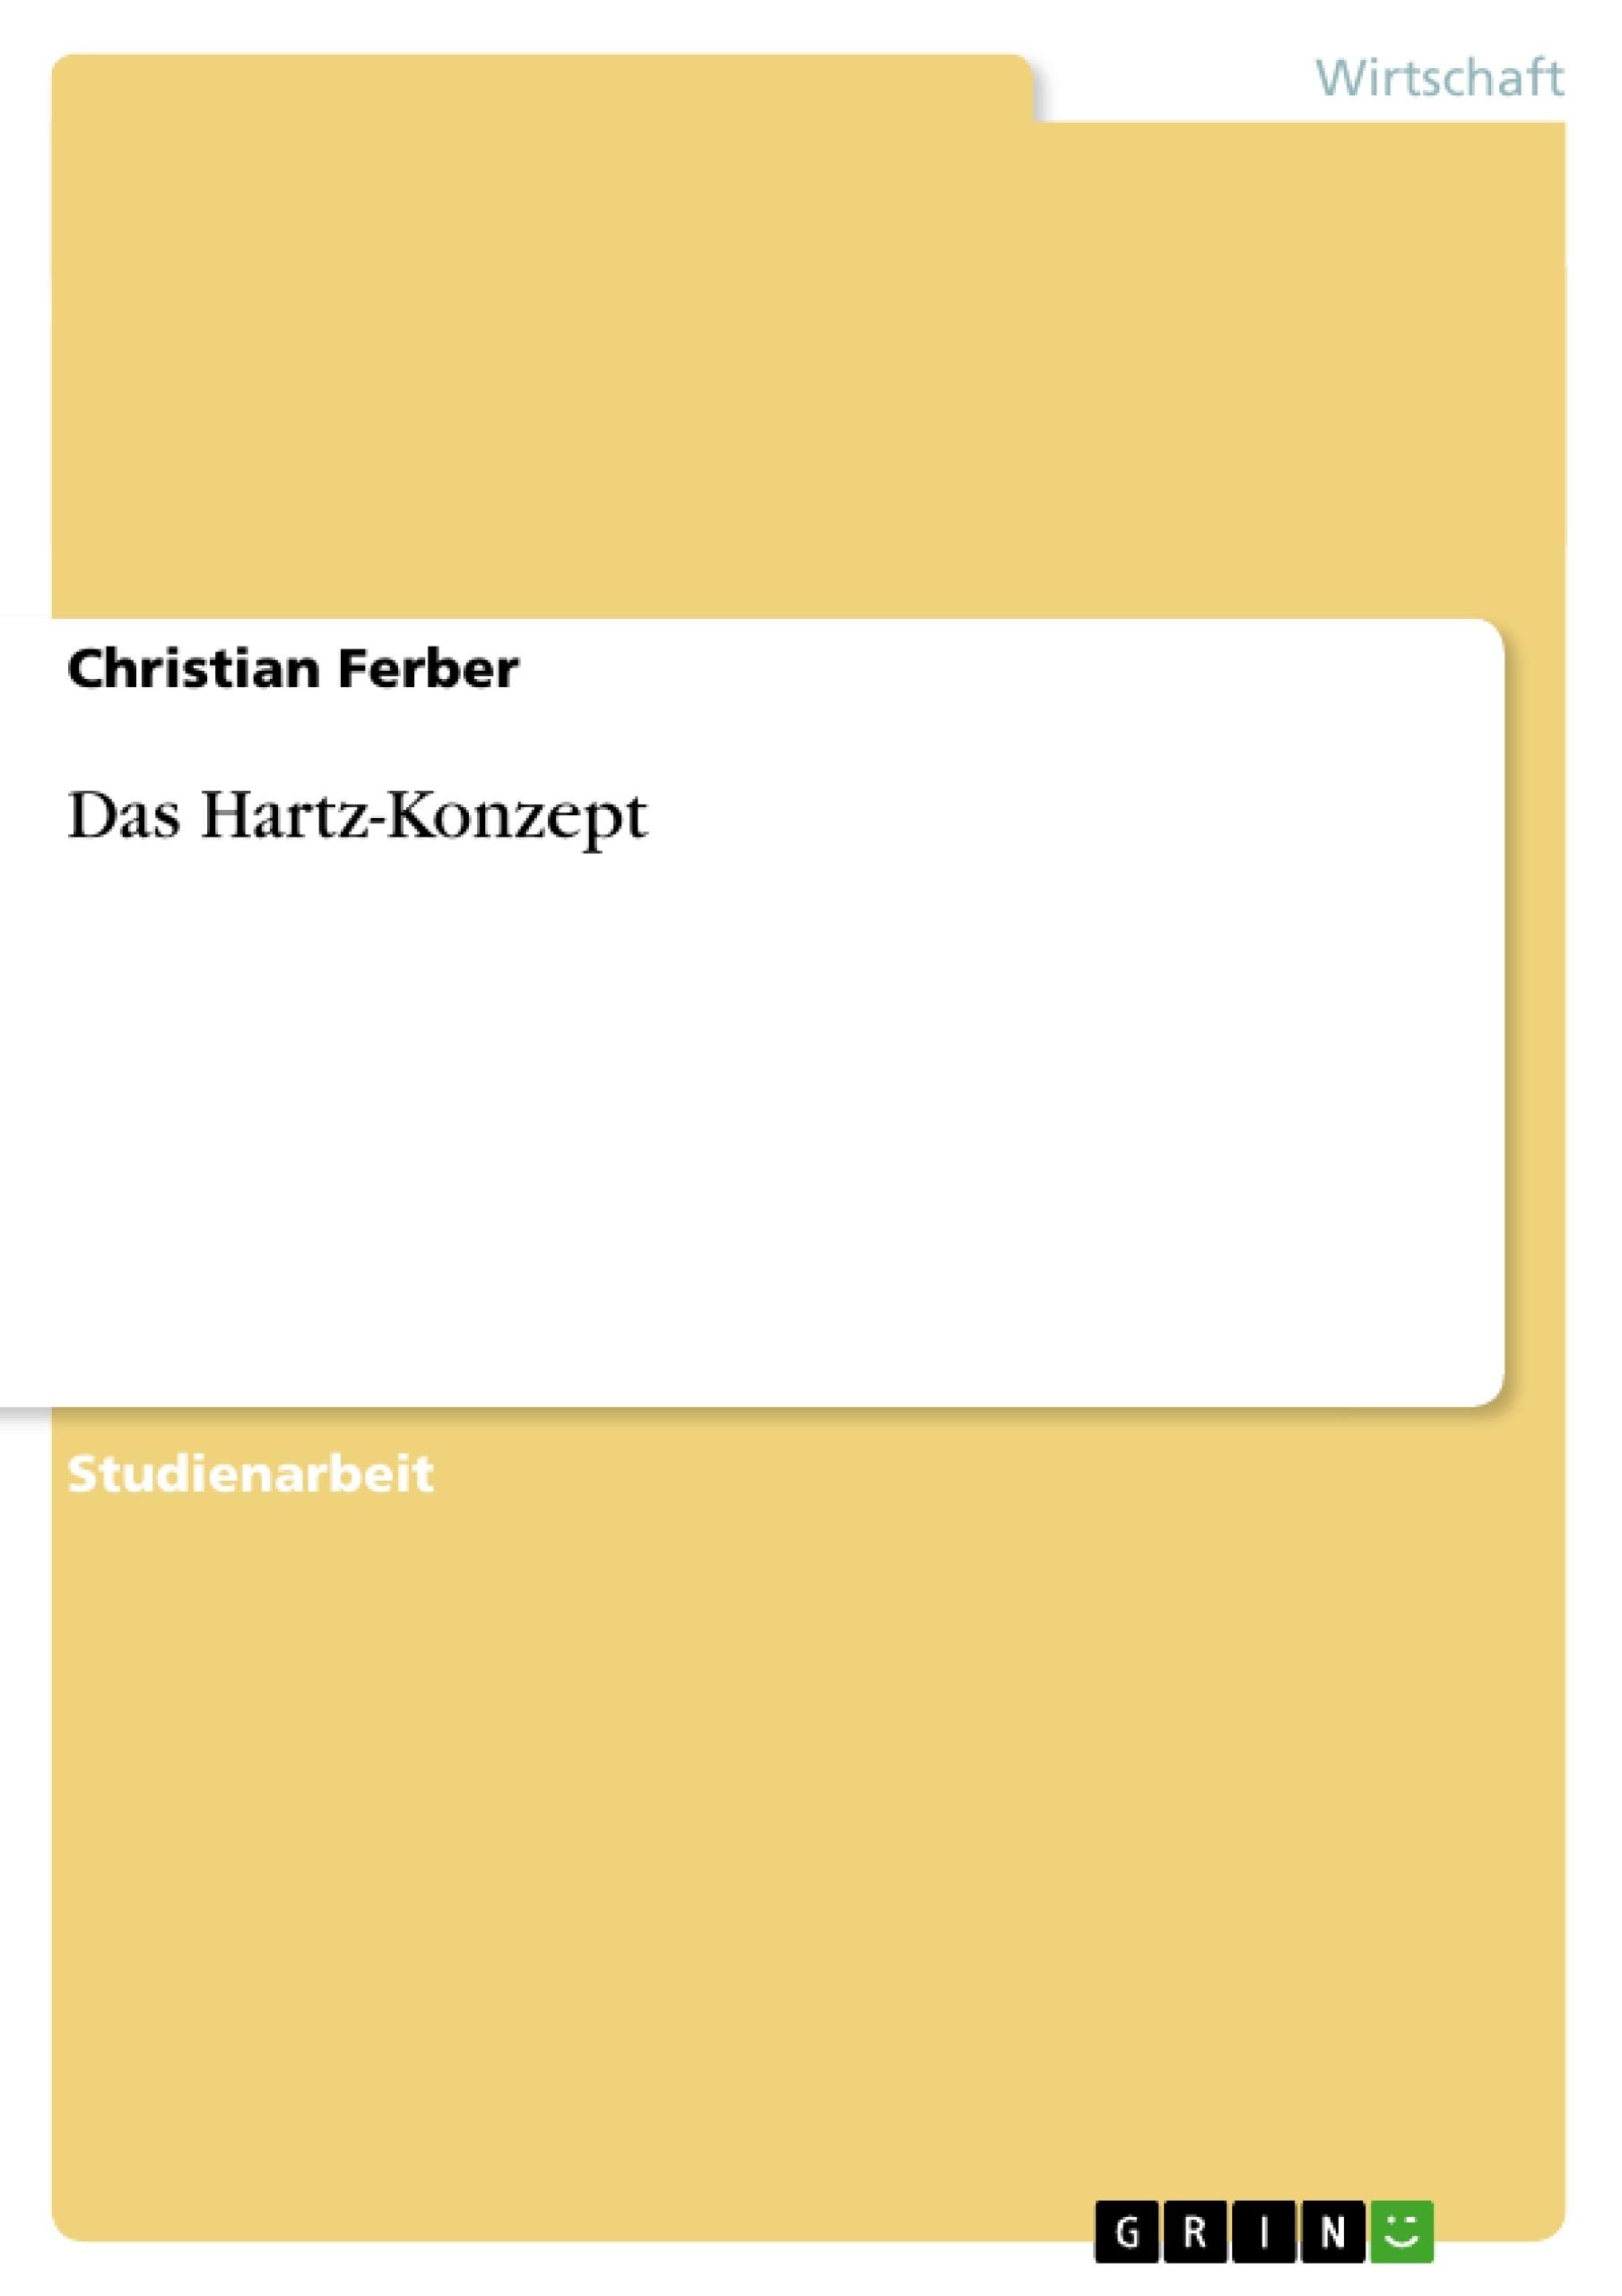 Titel: Das Hartz-Konzept